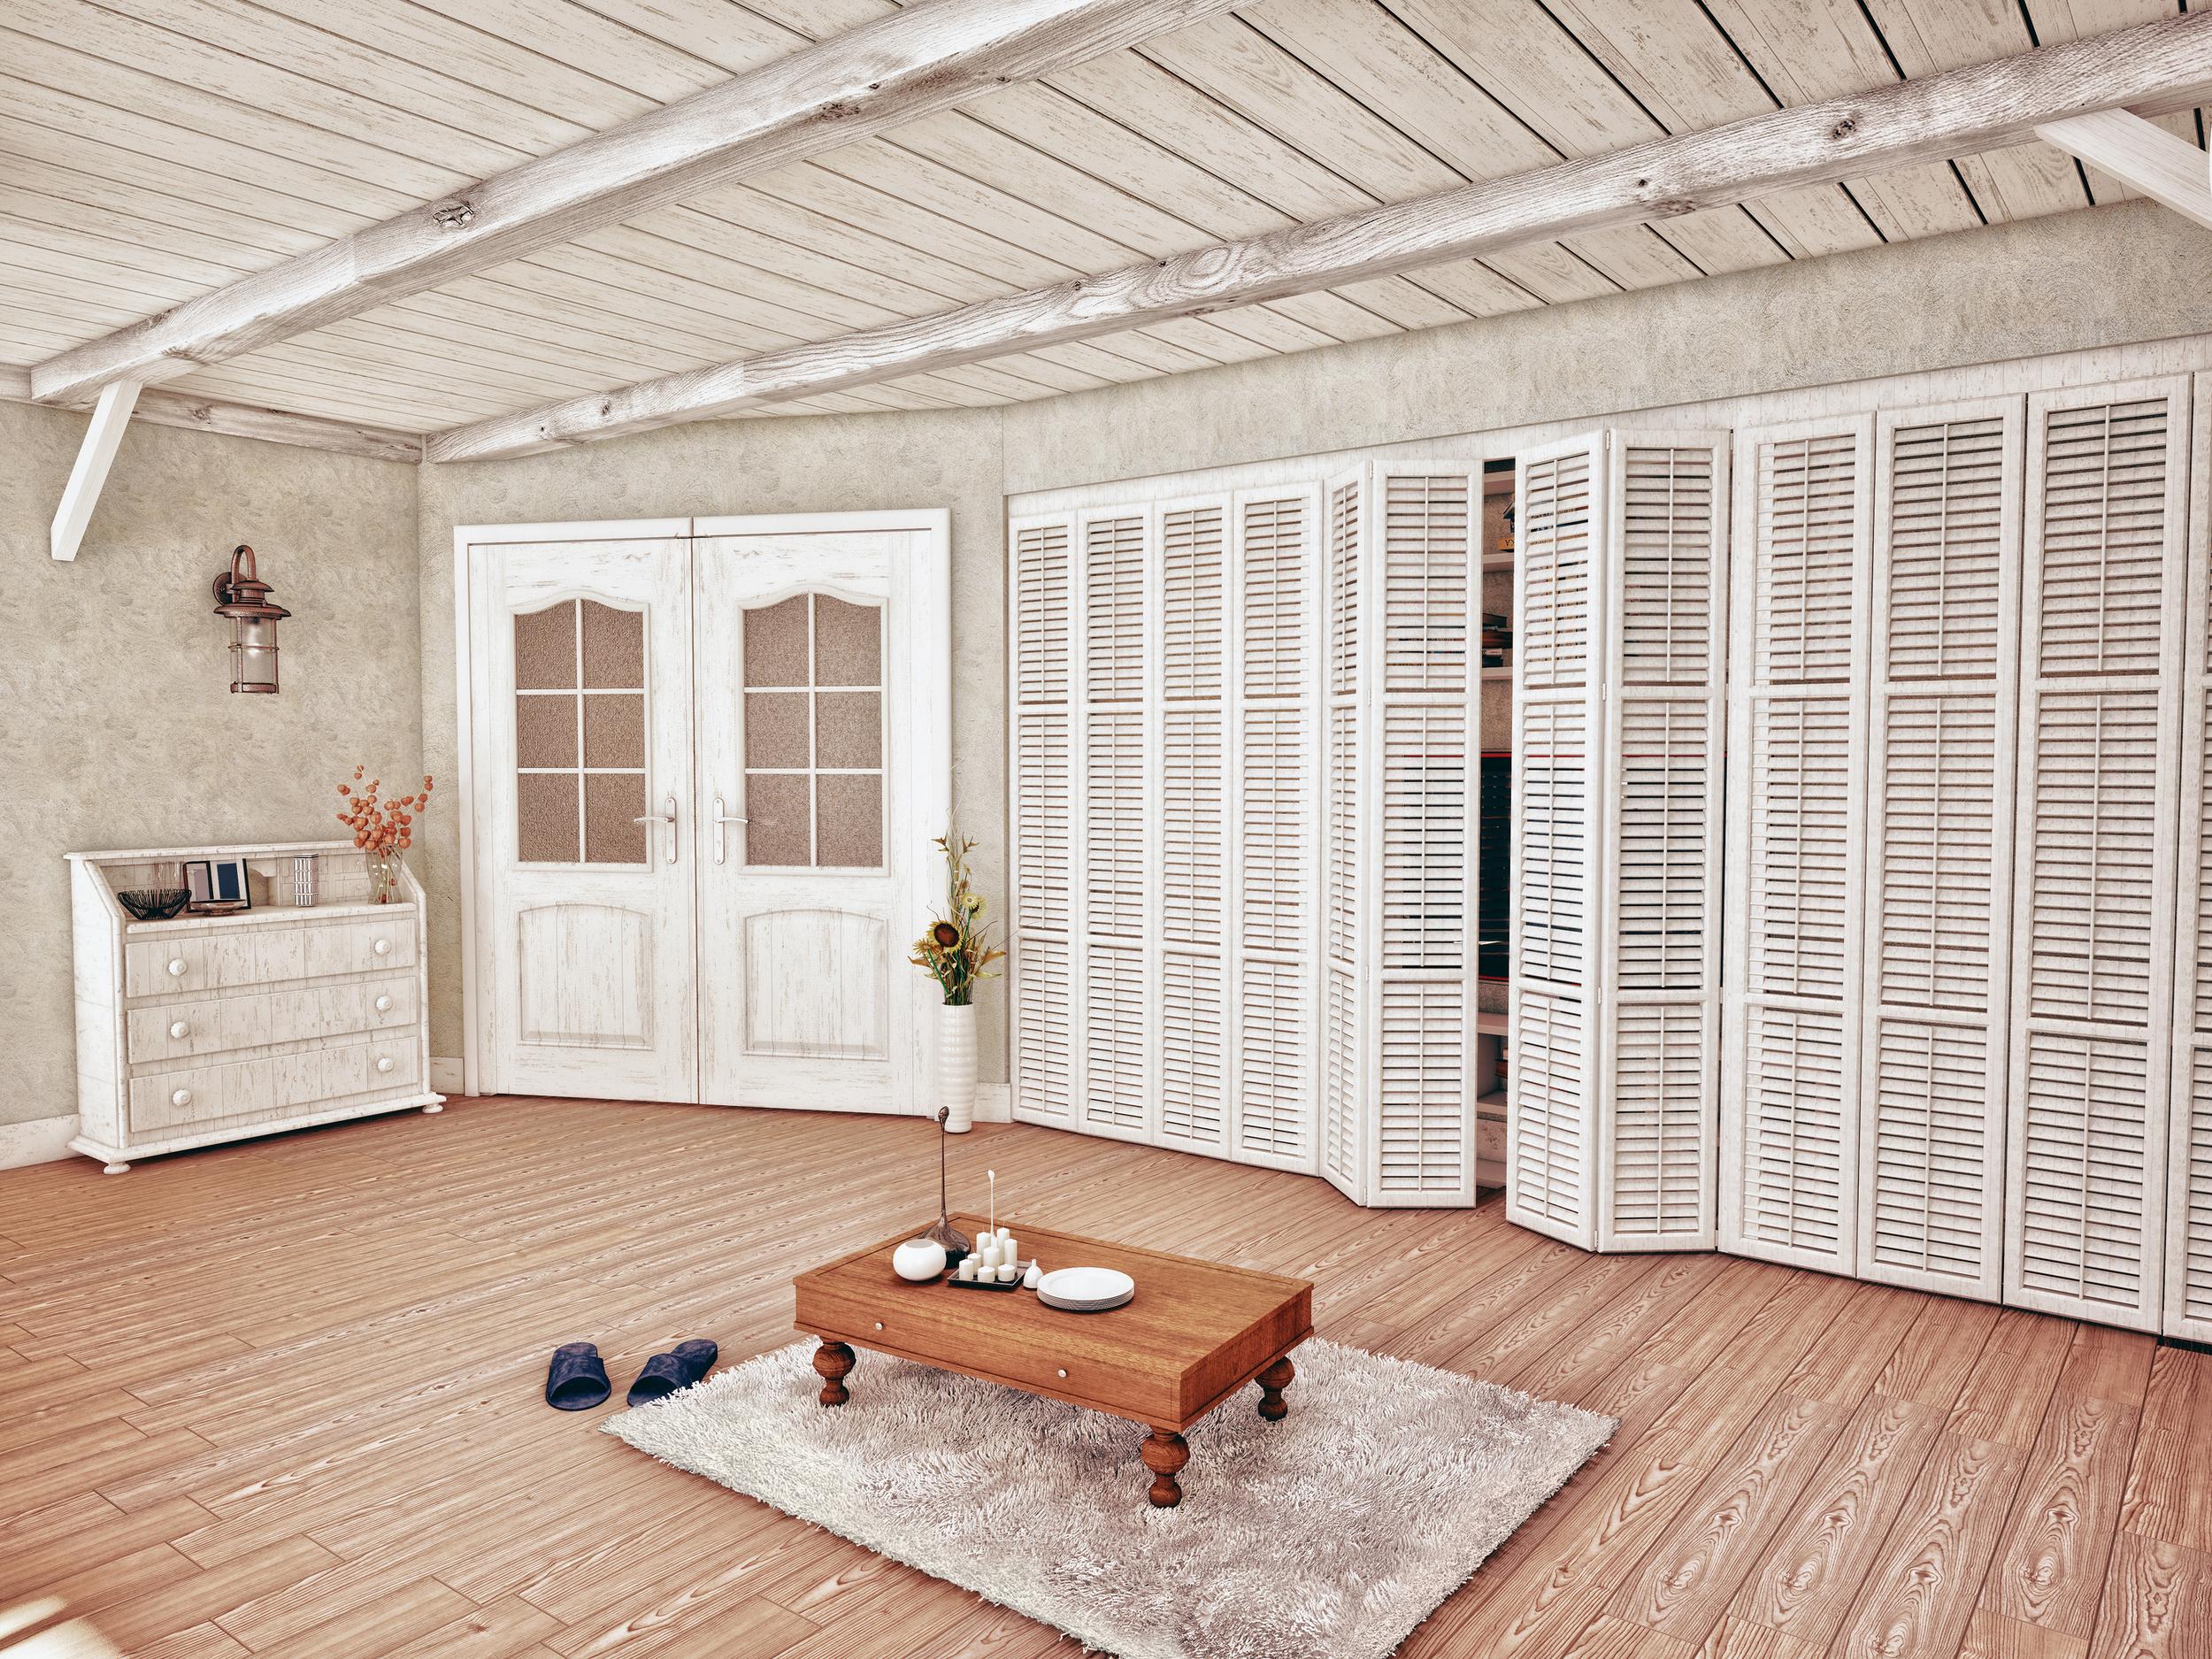 bigstock-Provence-style-interior-53349355.jpg